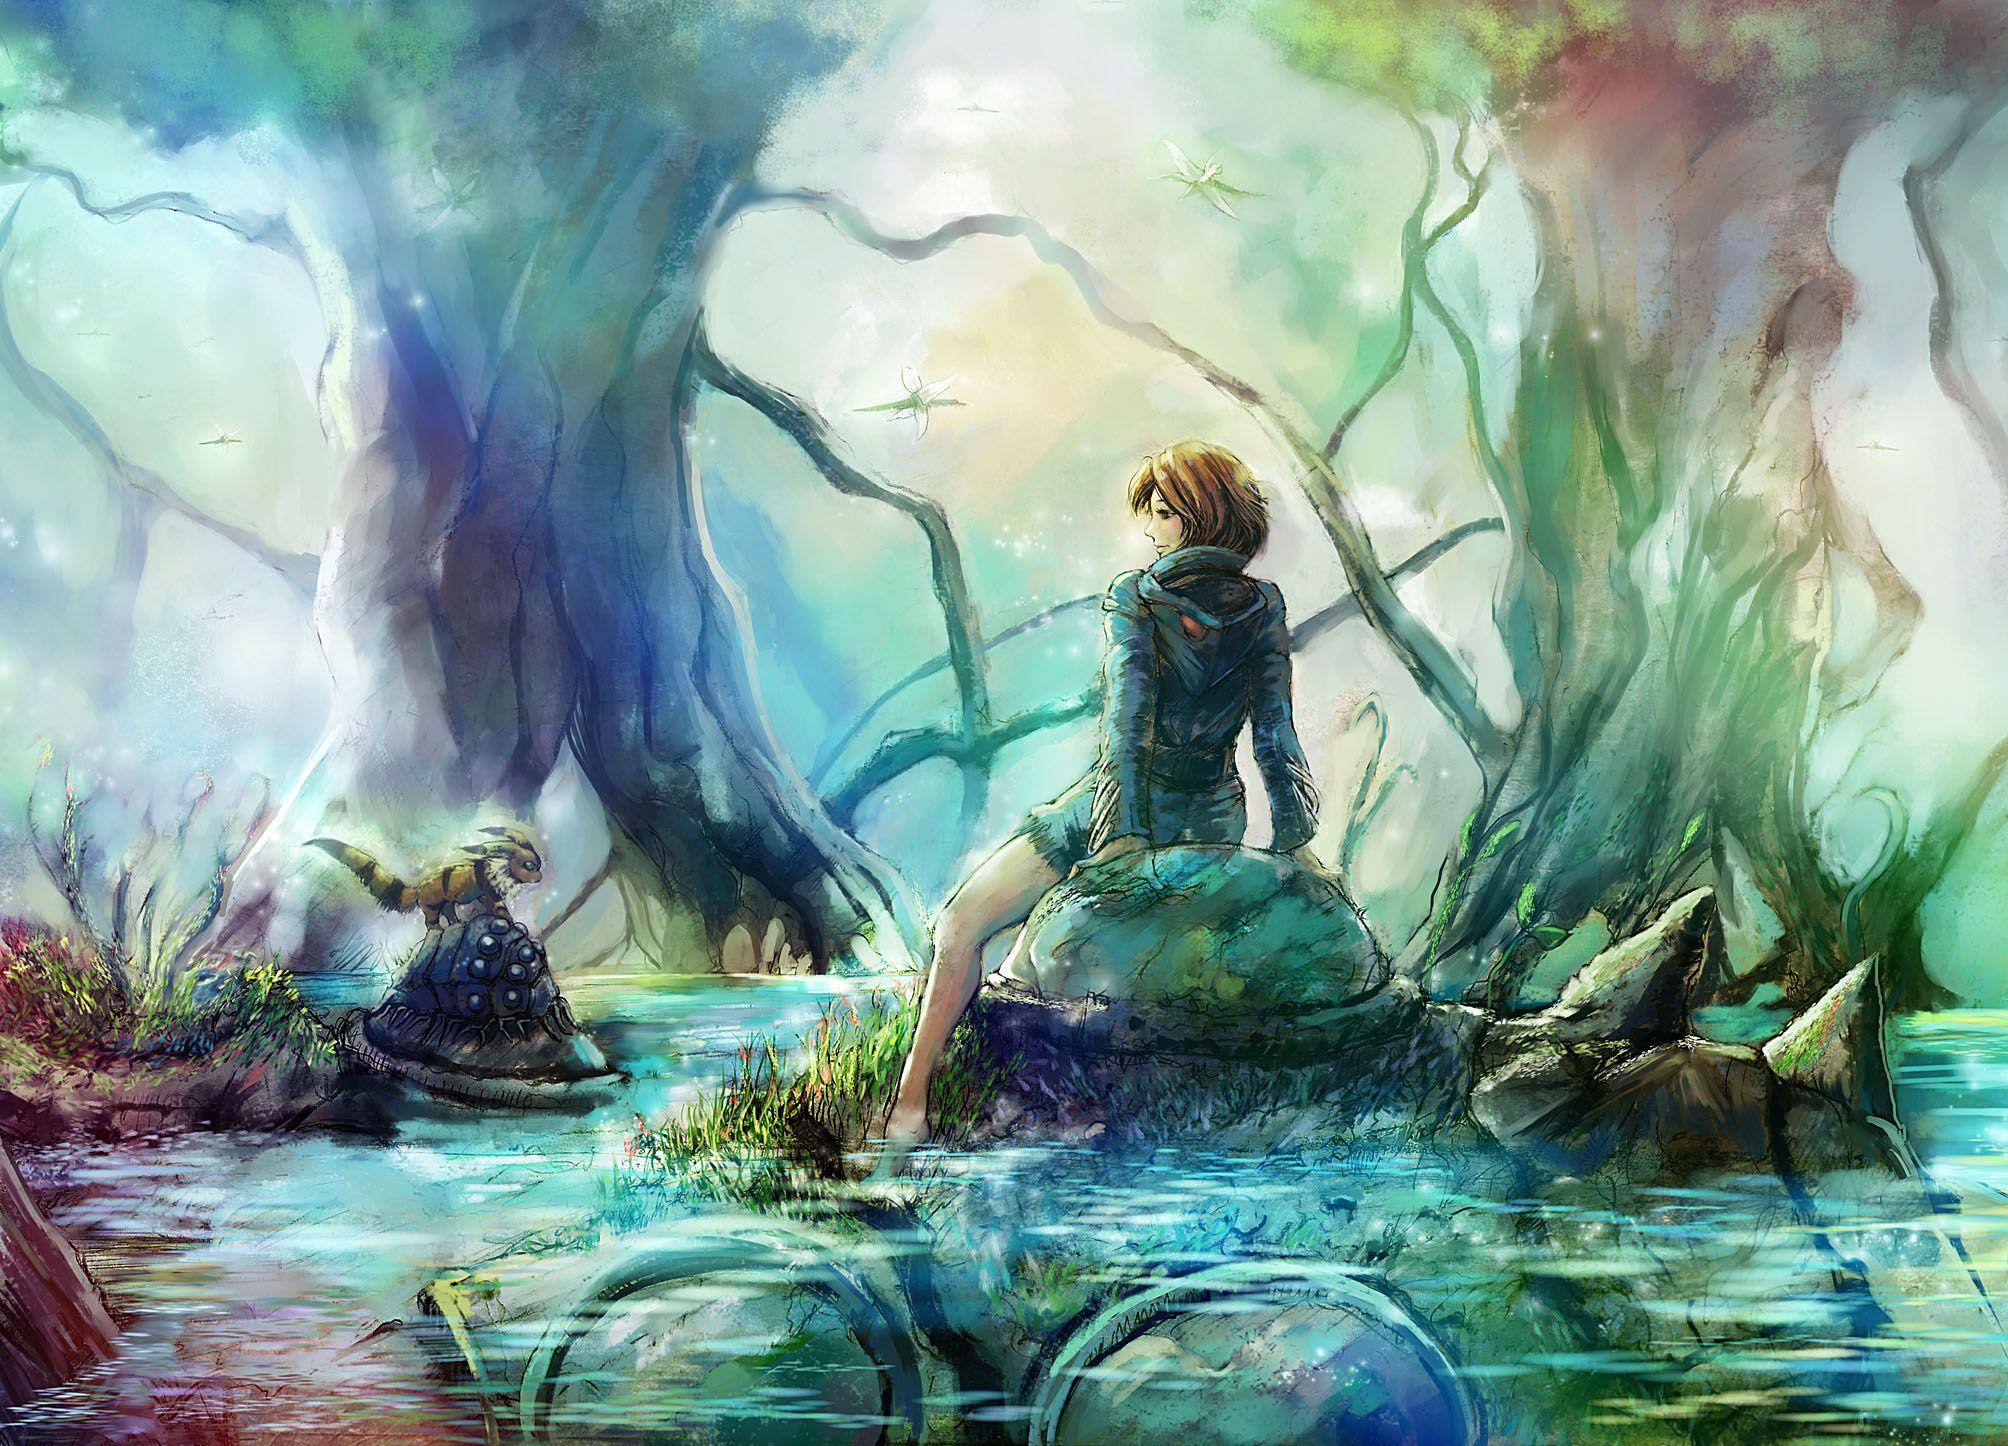 Nausicaa Studio ghibli fanart, Ghibli